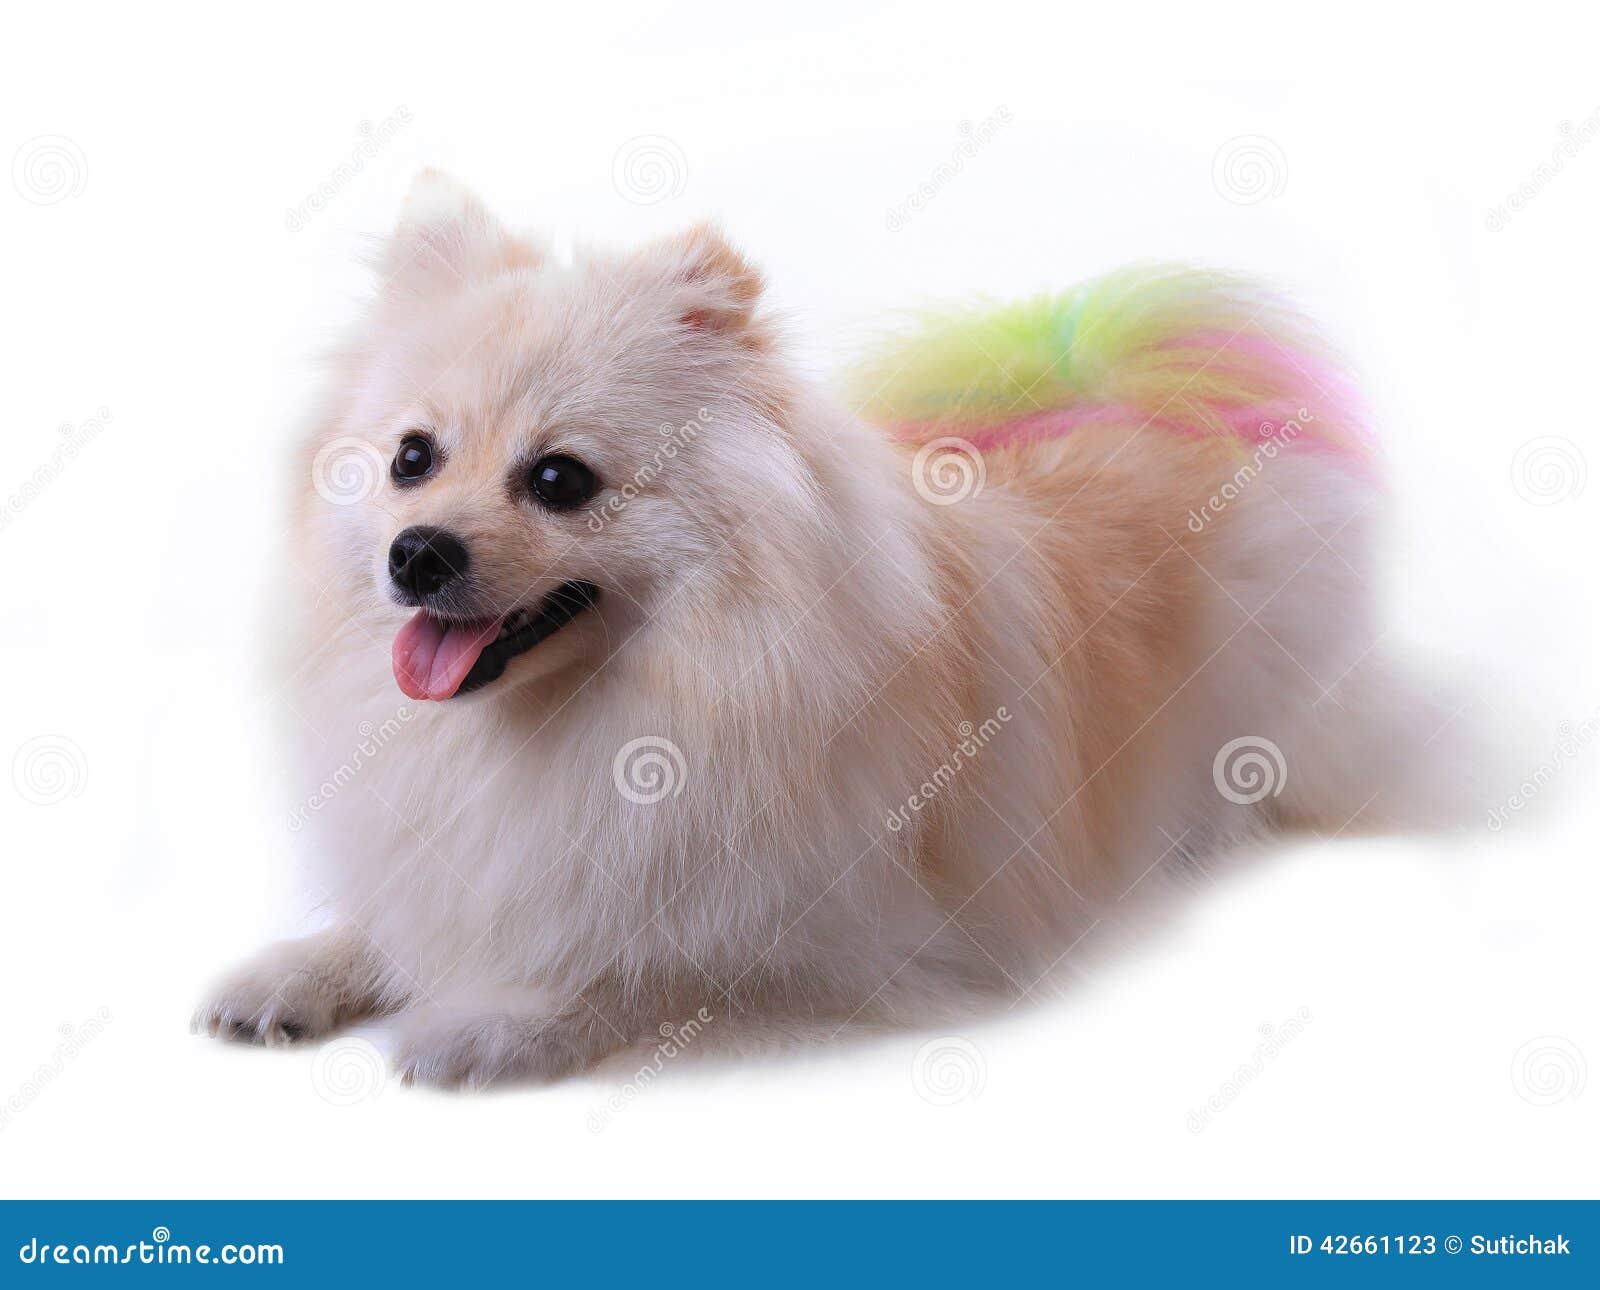 White Pomeranian Dog Stock Image Image Of Hair Lovely 42661123